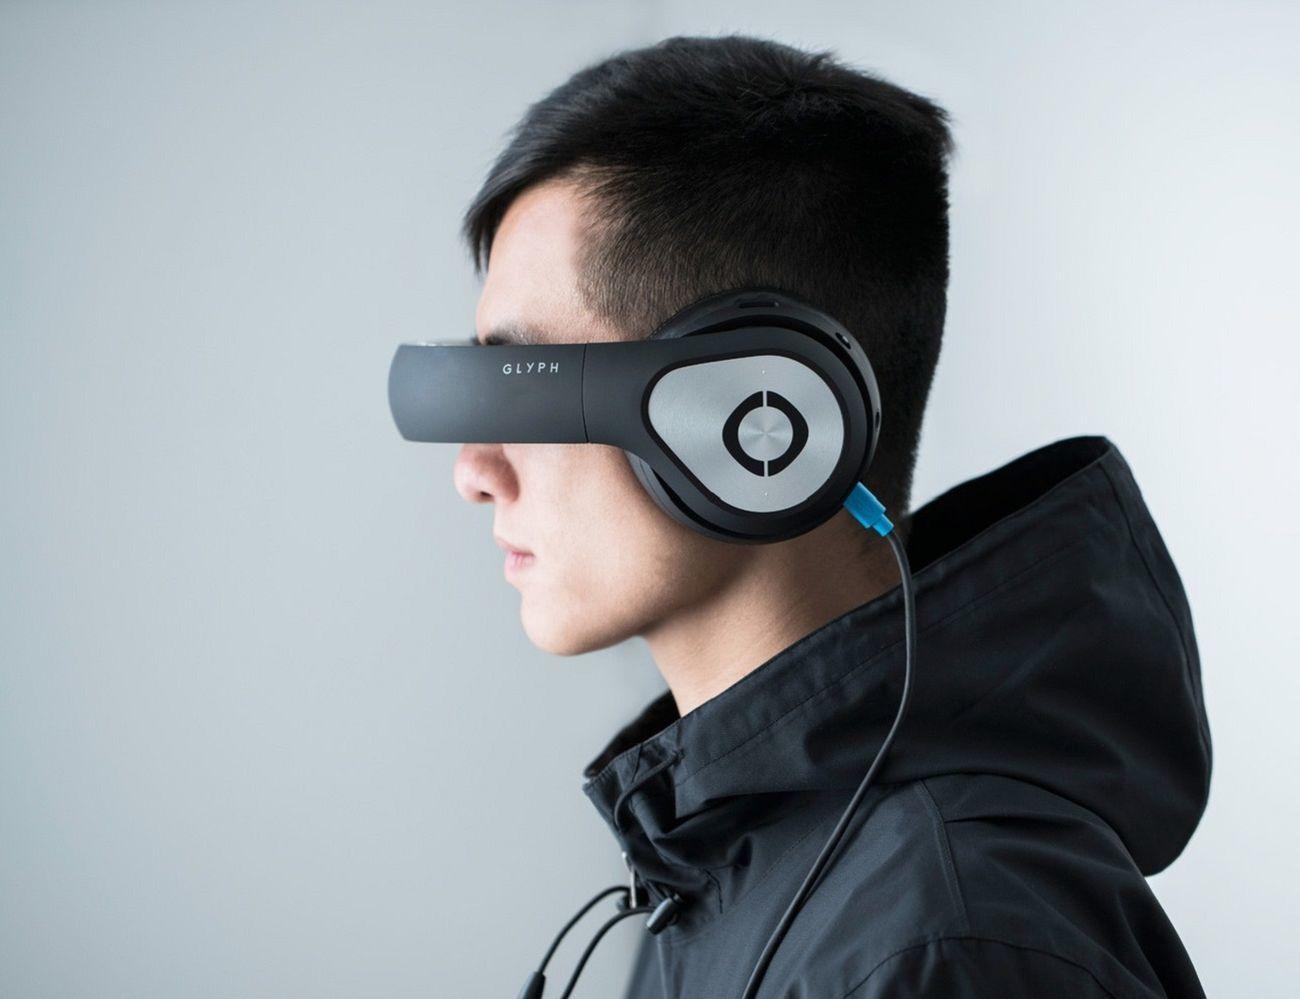 Avegant Glyph Headset